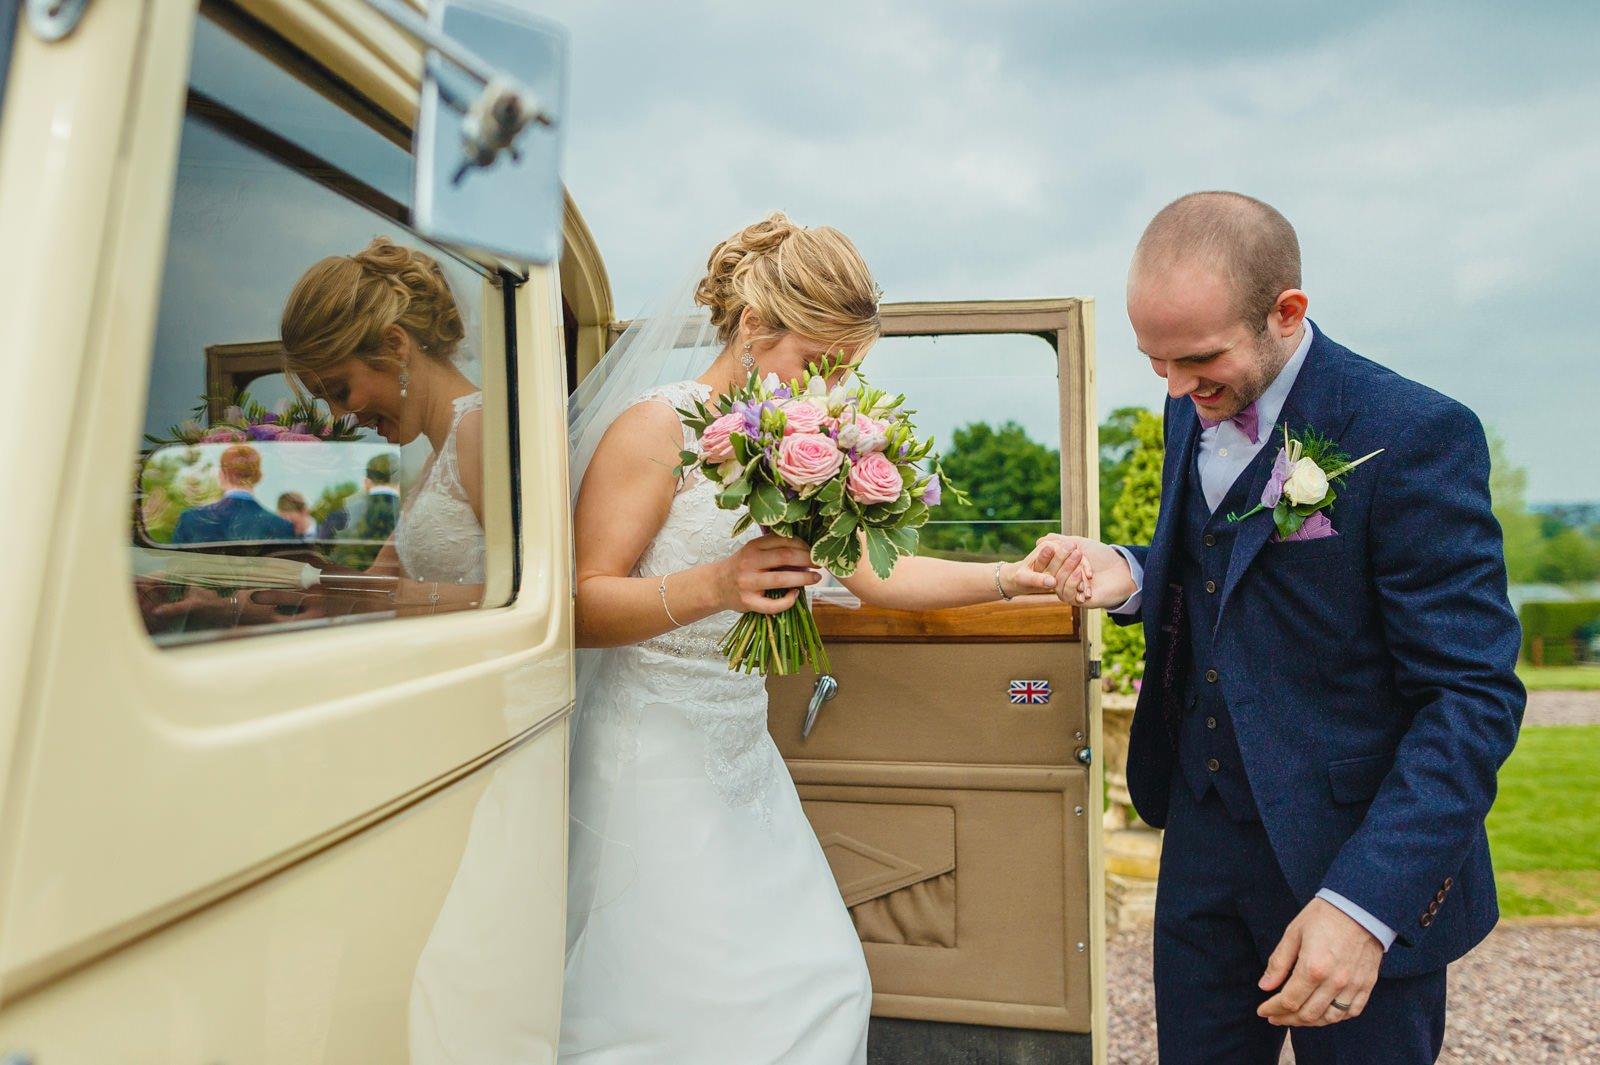 Millers Of Netley wedding, Dorrington, Shrewsbury | Emma + Ben 40